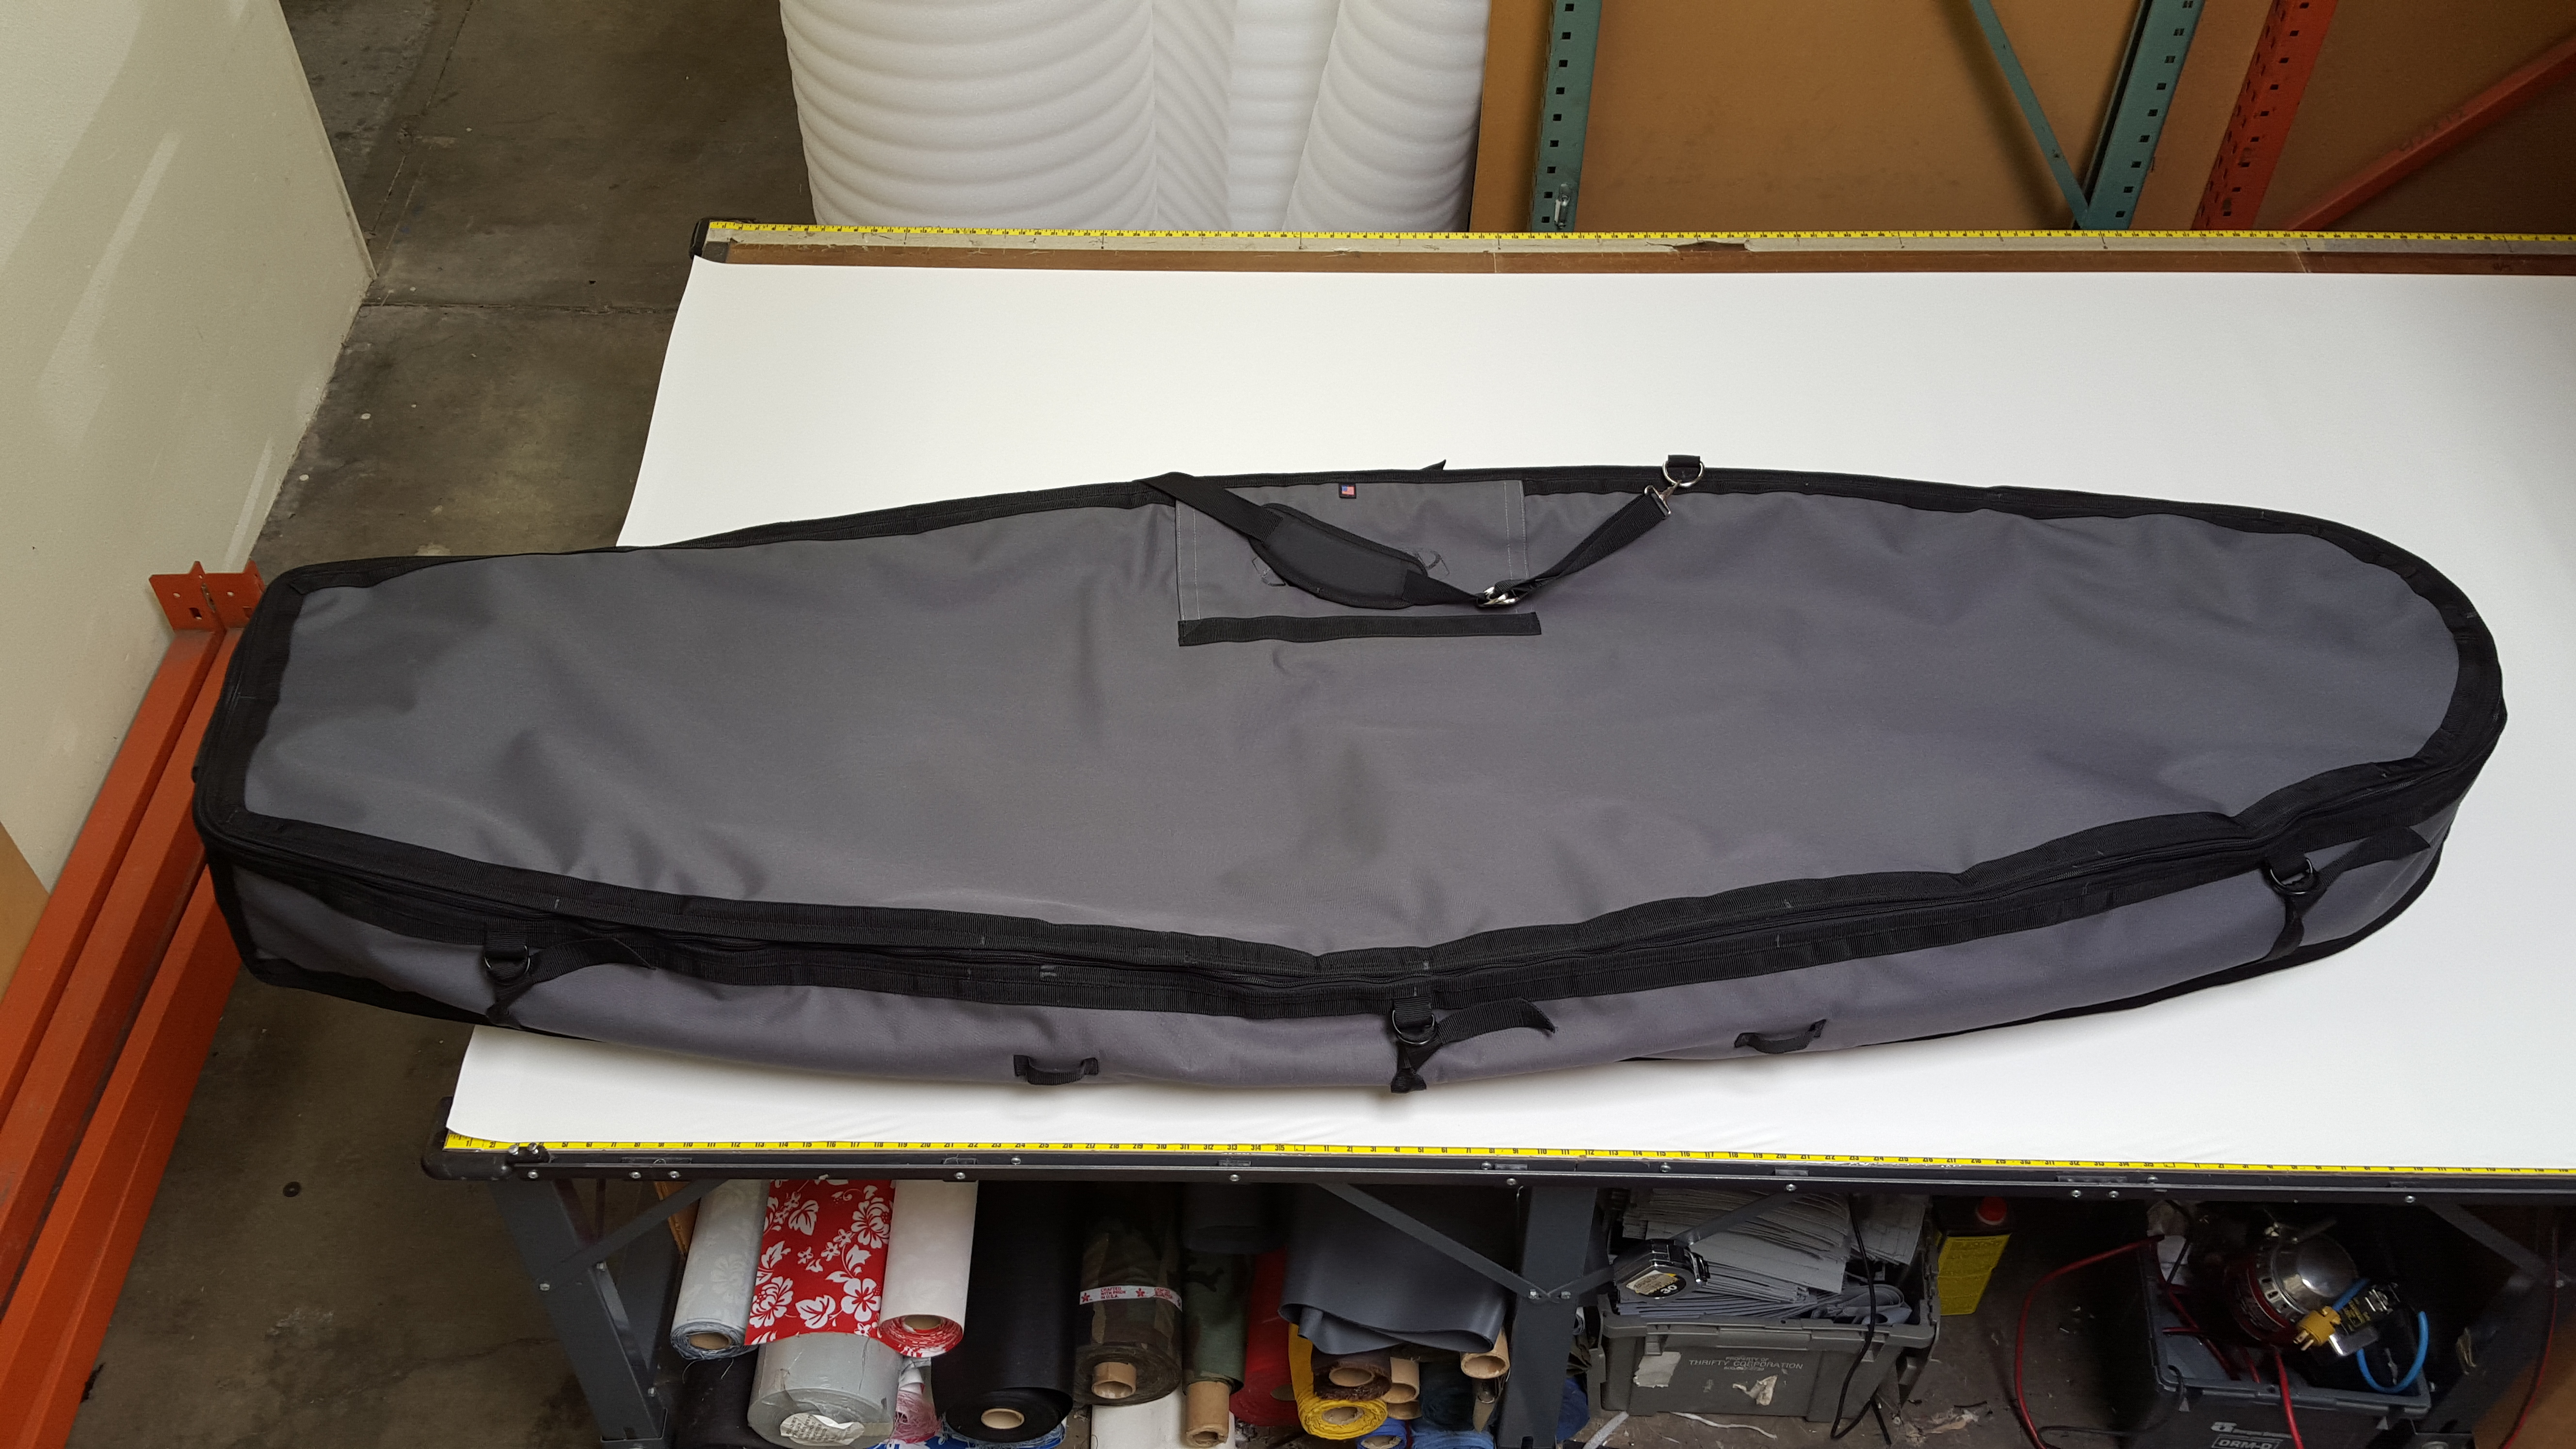 Custon Wheeled Coffin Travel Bag for SUP, Longboard & Surfboard